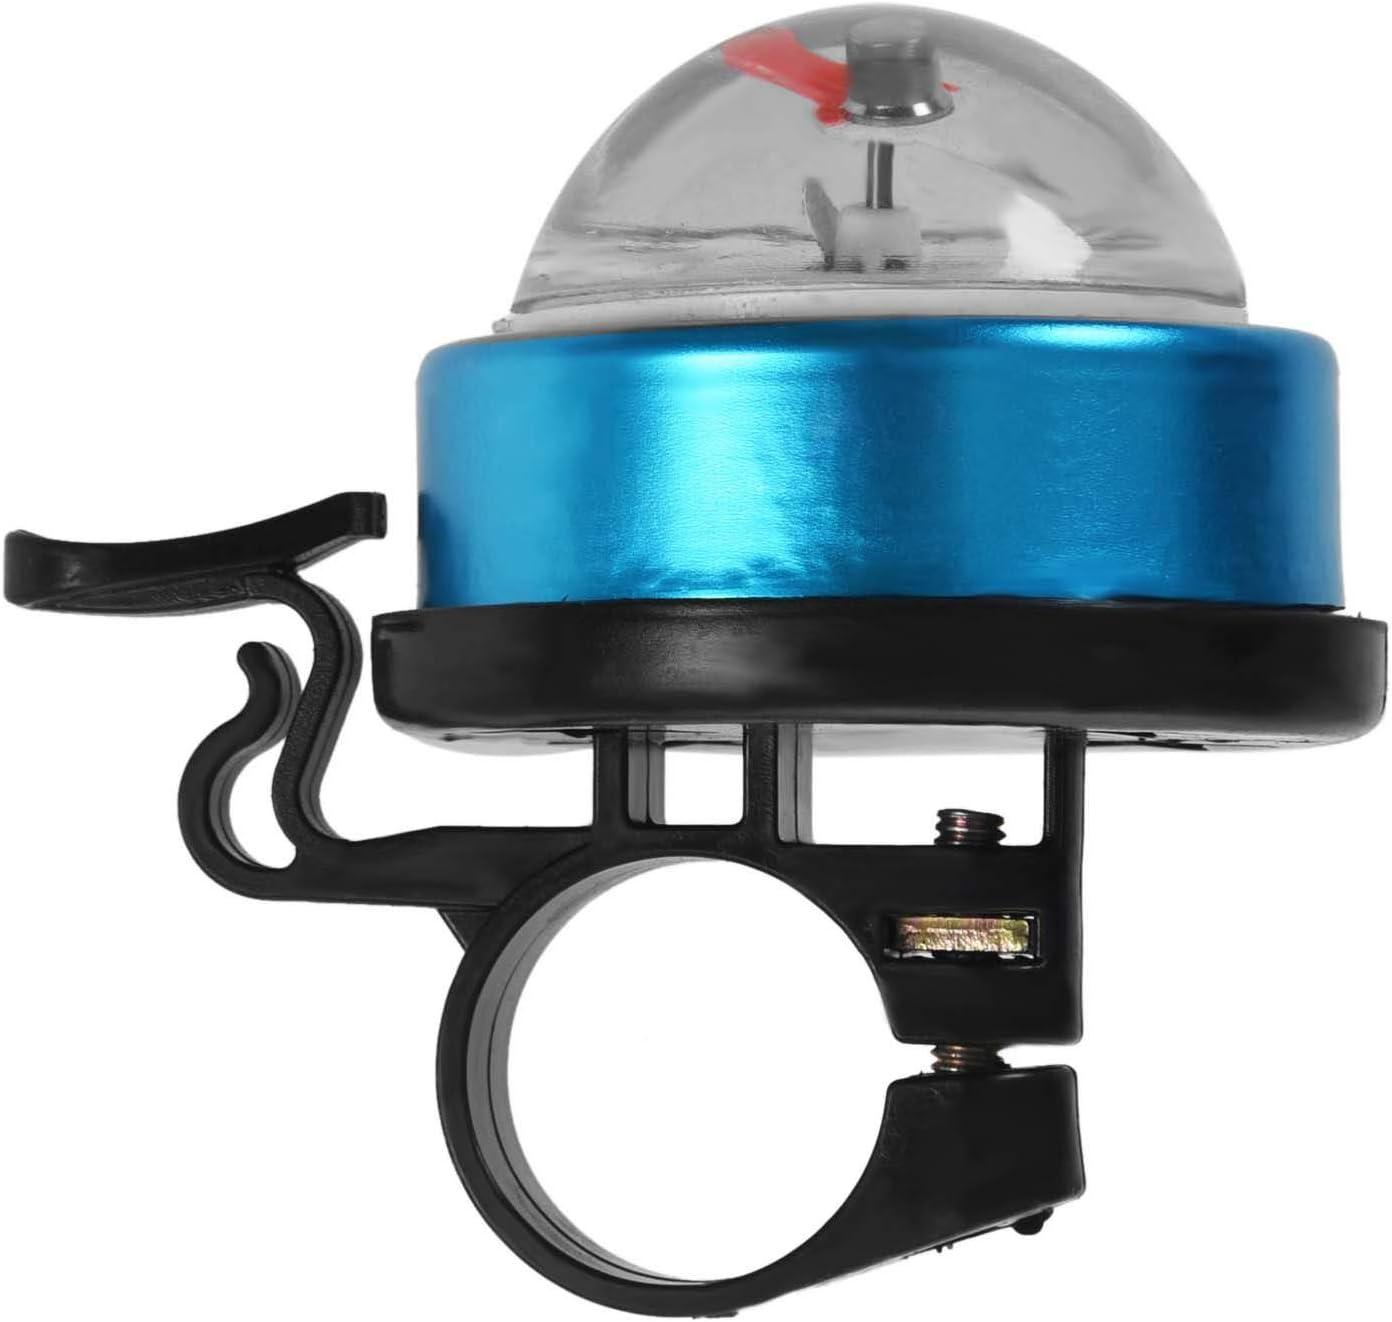 Br/újula para bicicleta RETYLY timbre alarma 22 mm de di/ámetro color azul y negro